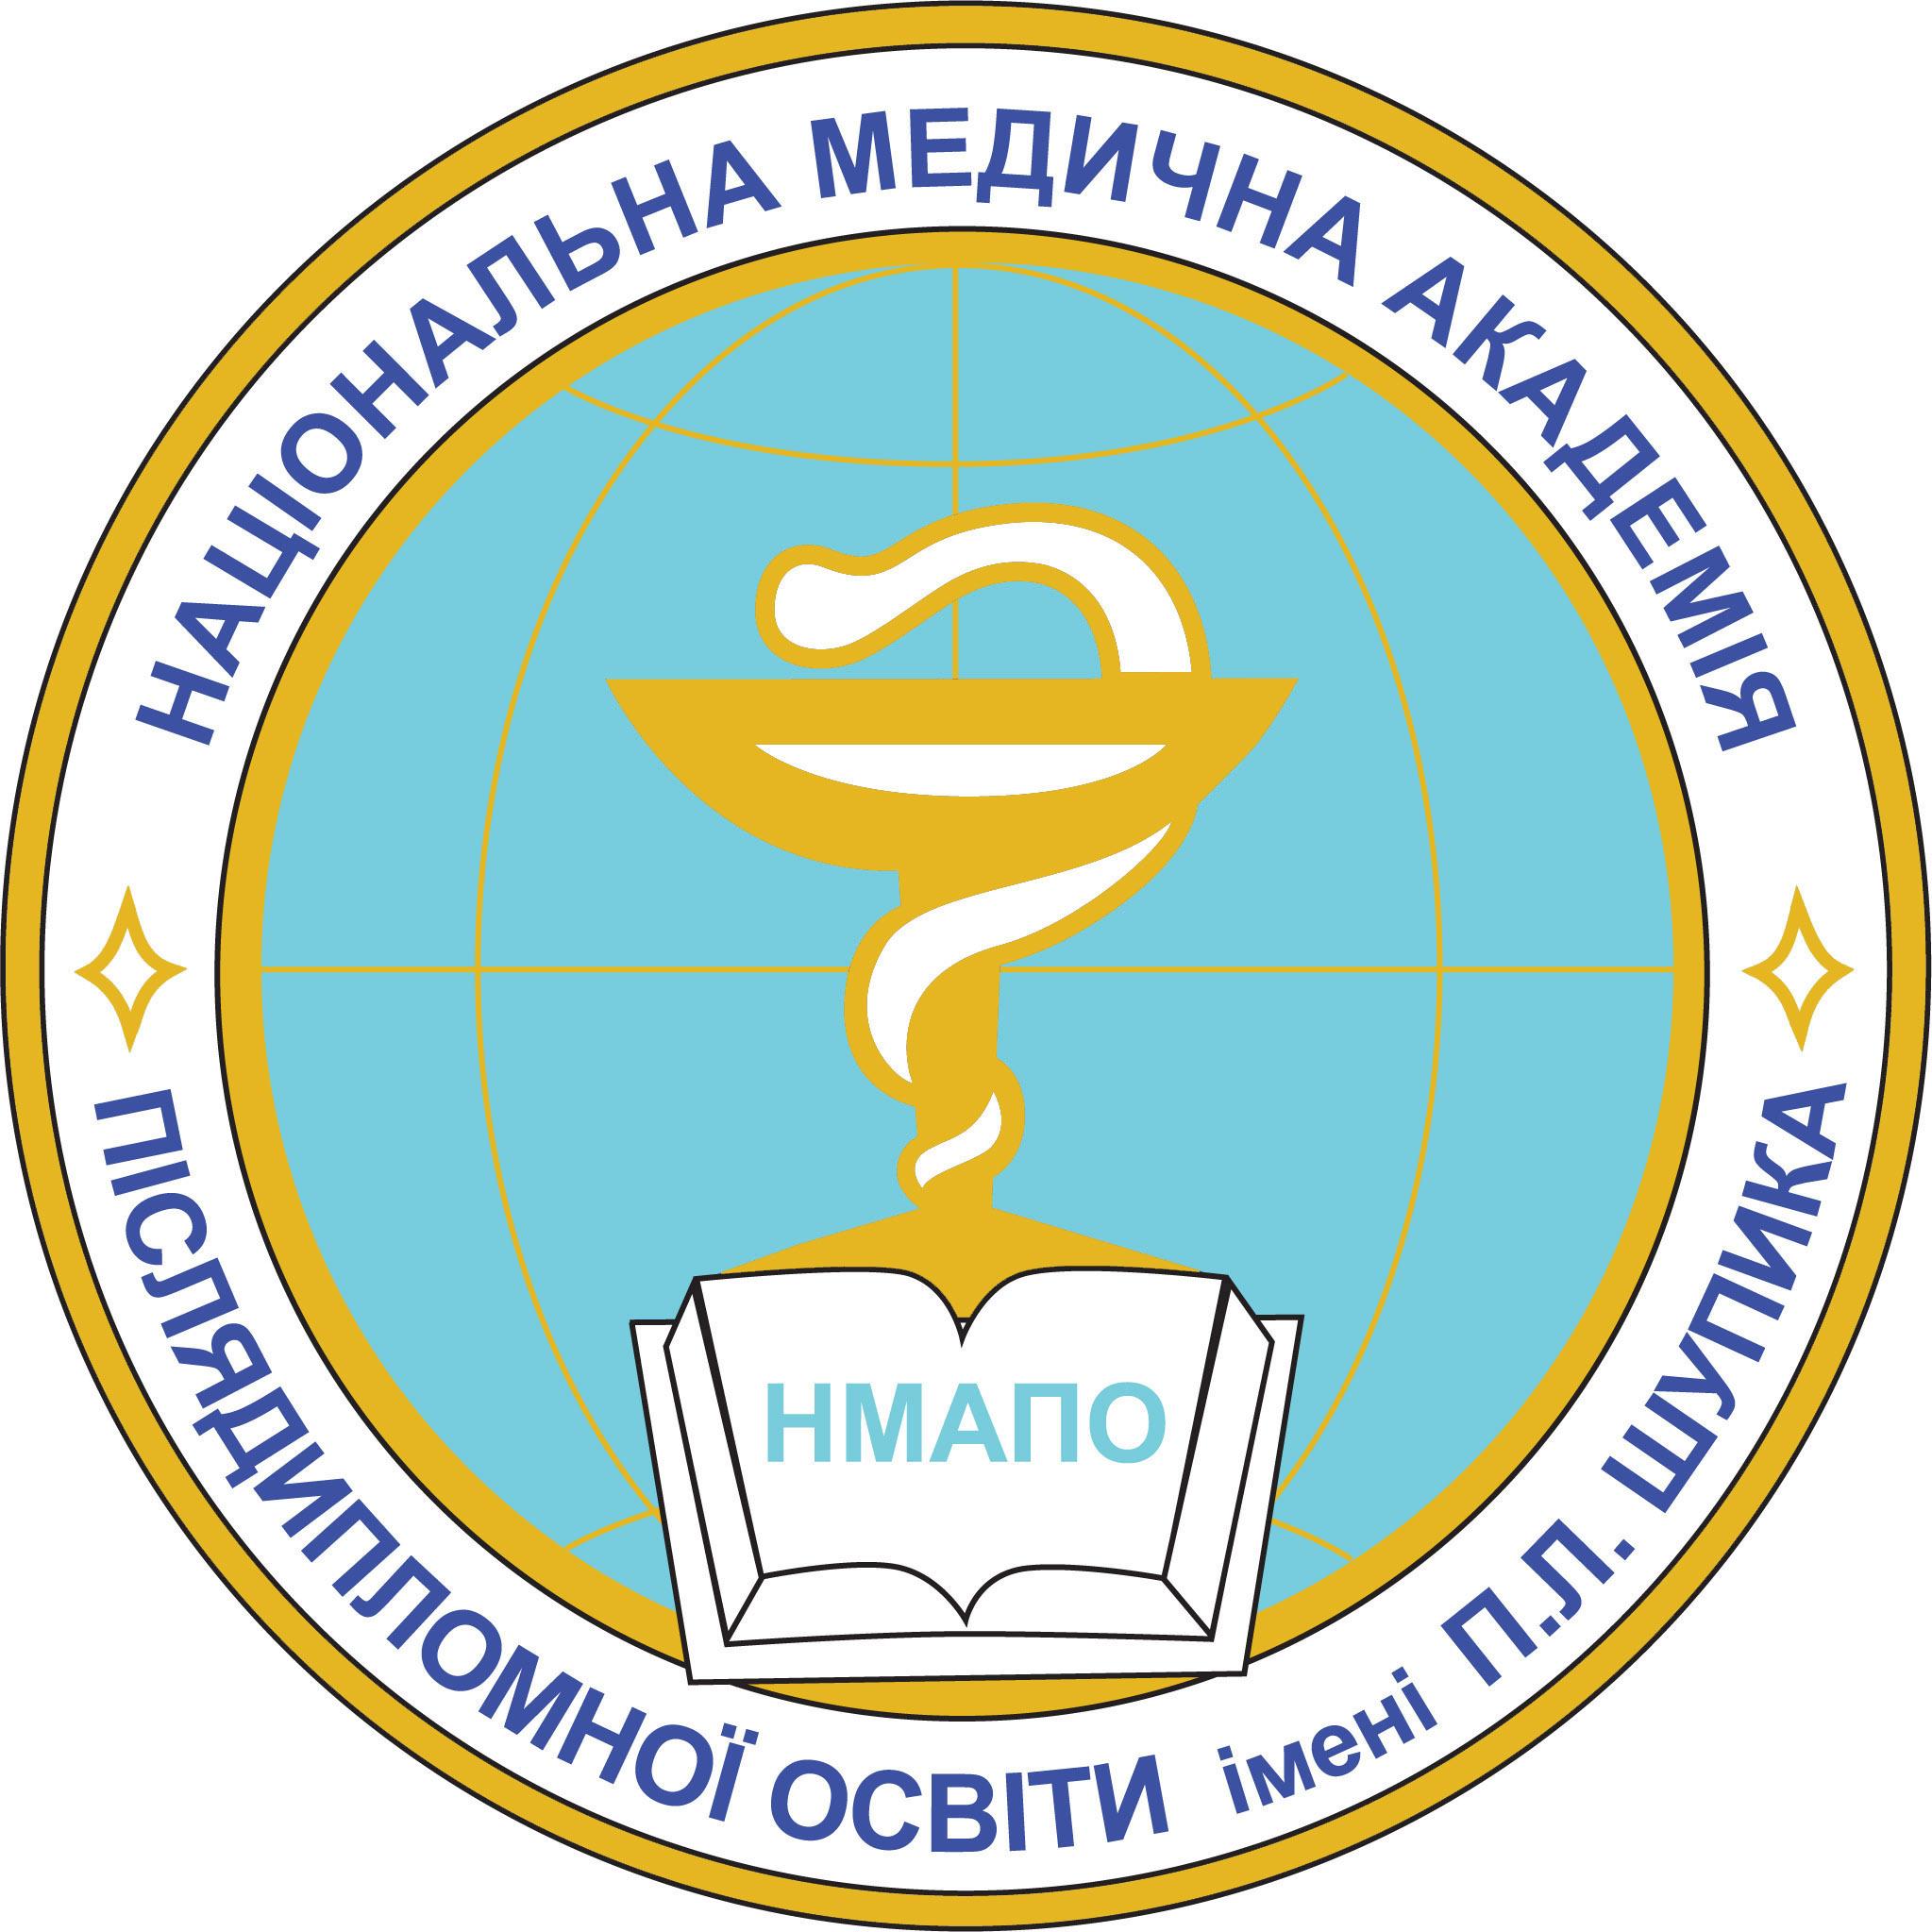 P.L. Shupyk National Medical Academy of Postgraduate Education